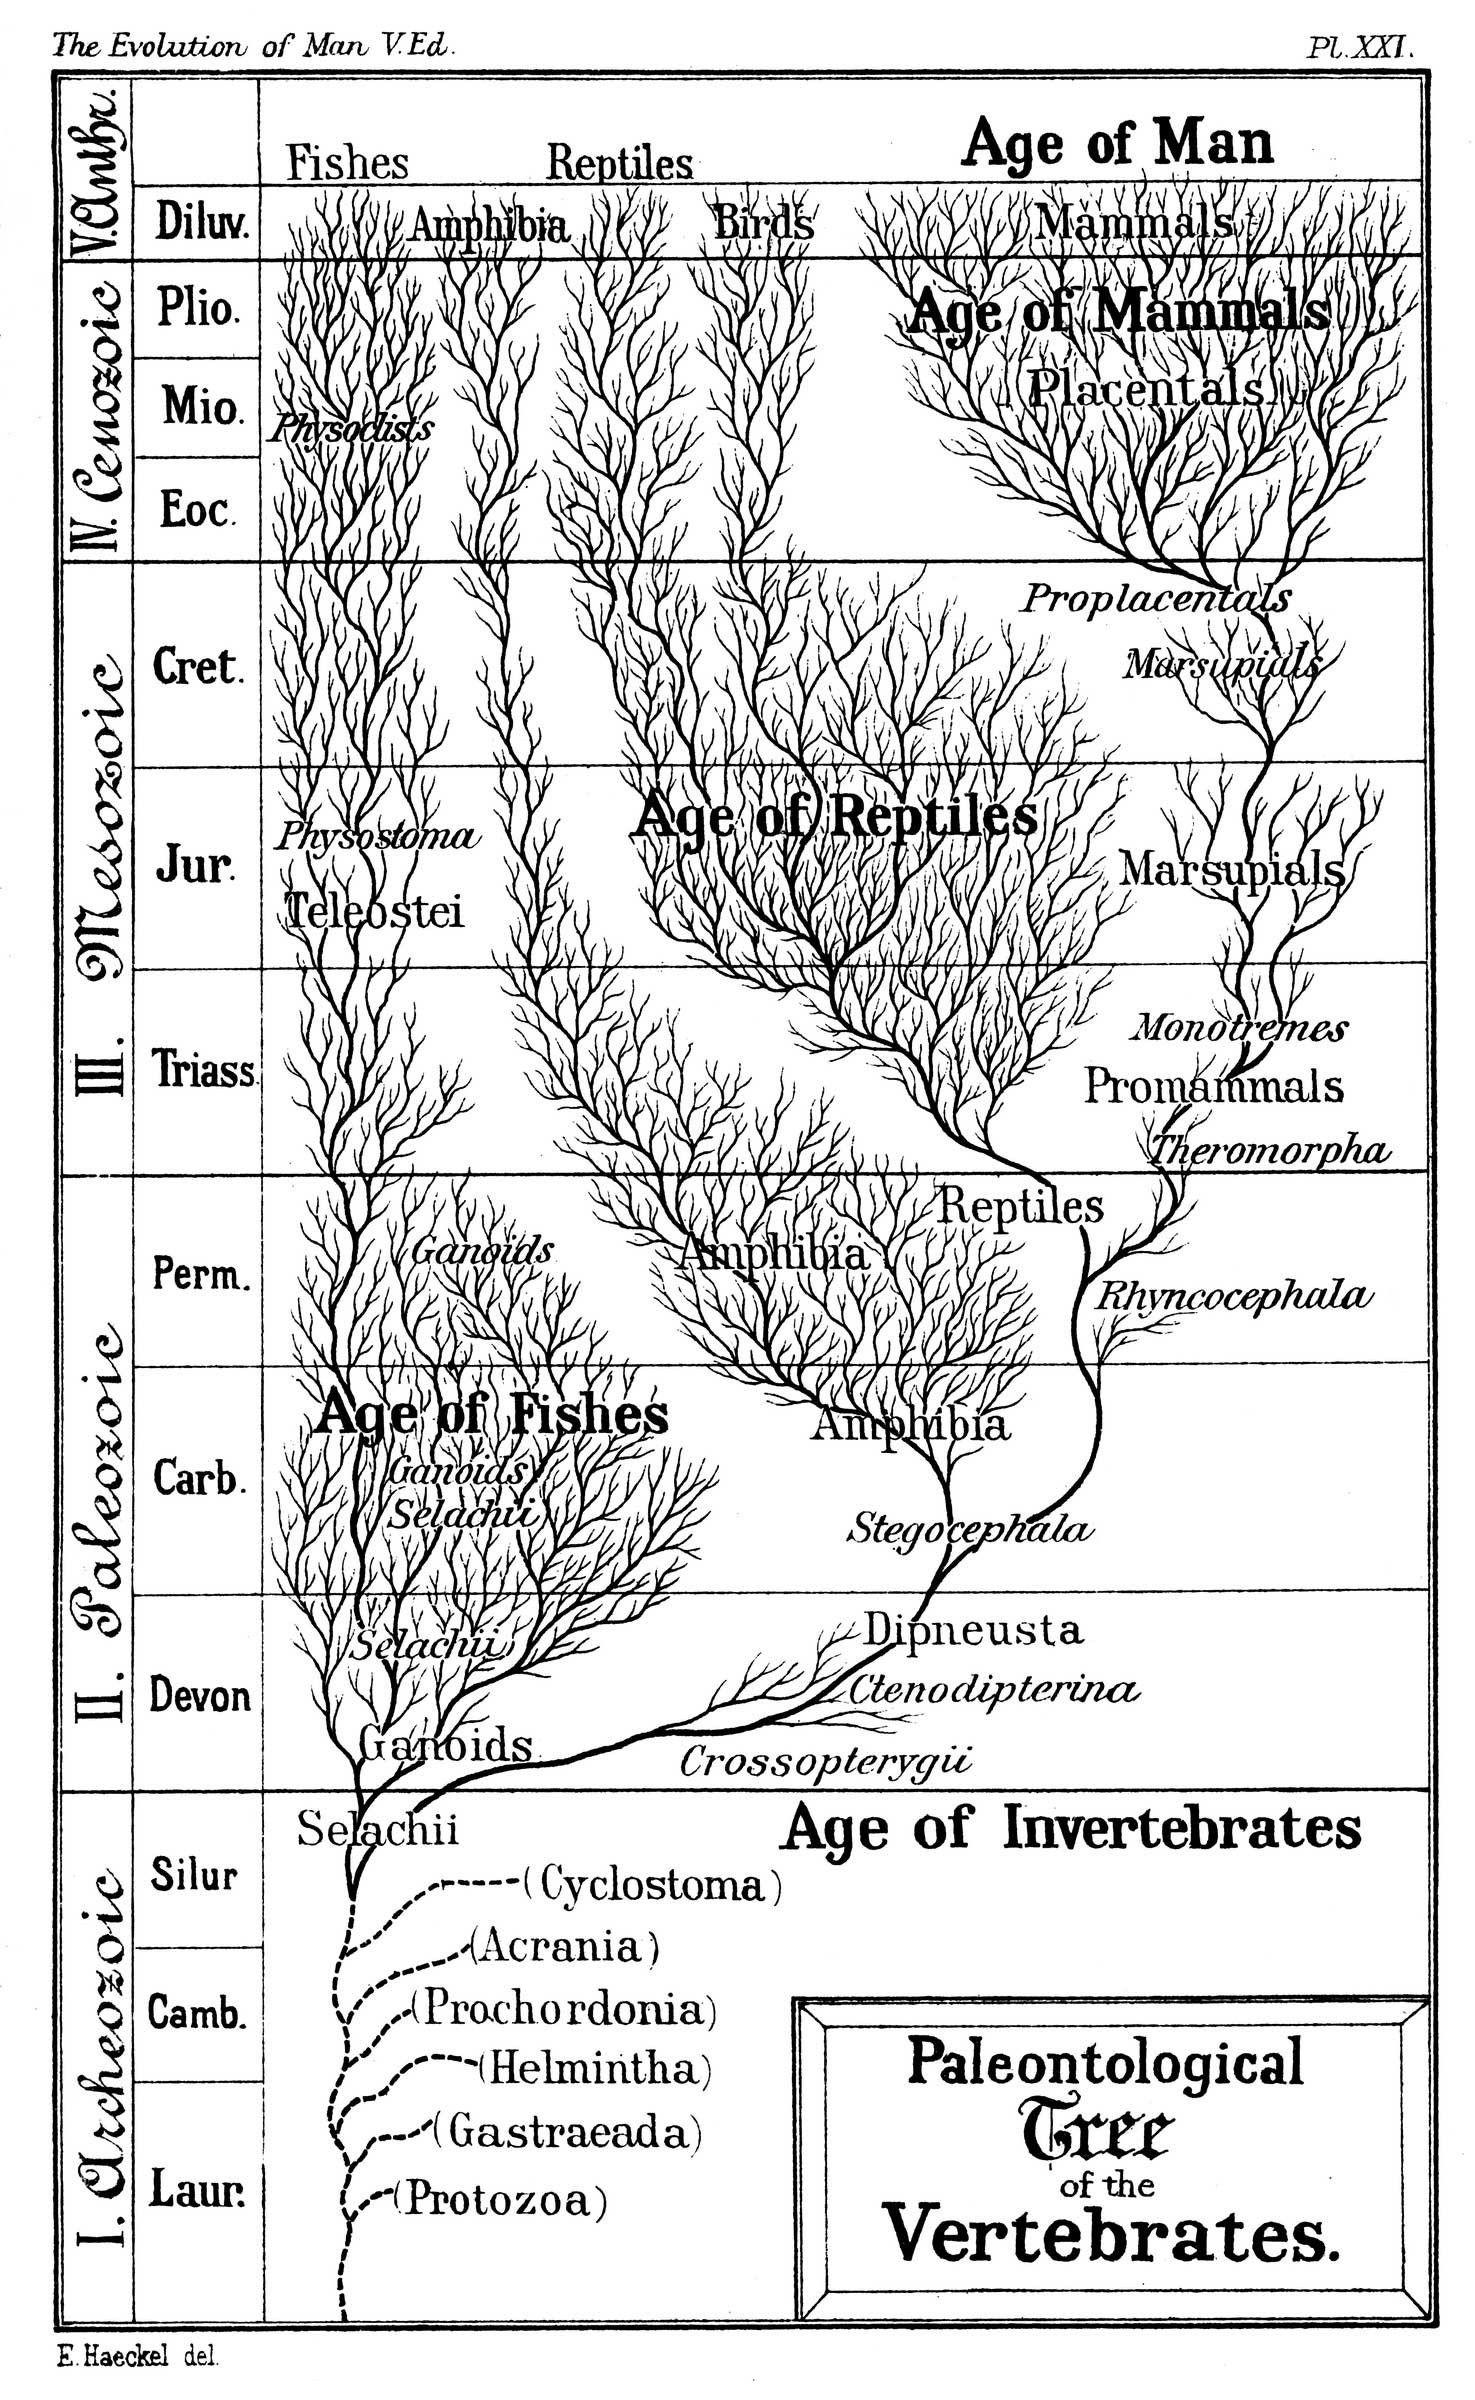 Evidence Of Evolution Worksheet Answers Classified Ficial Evidence Evolution Worksheet Answers